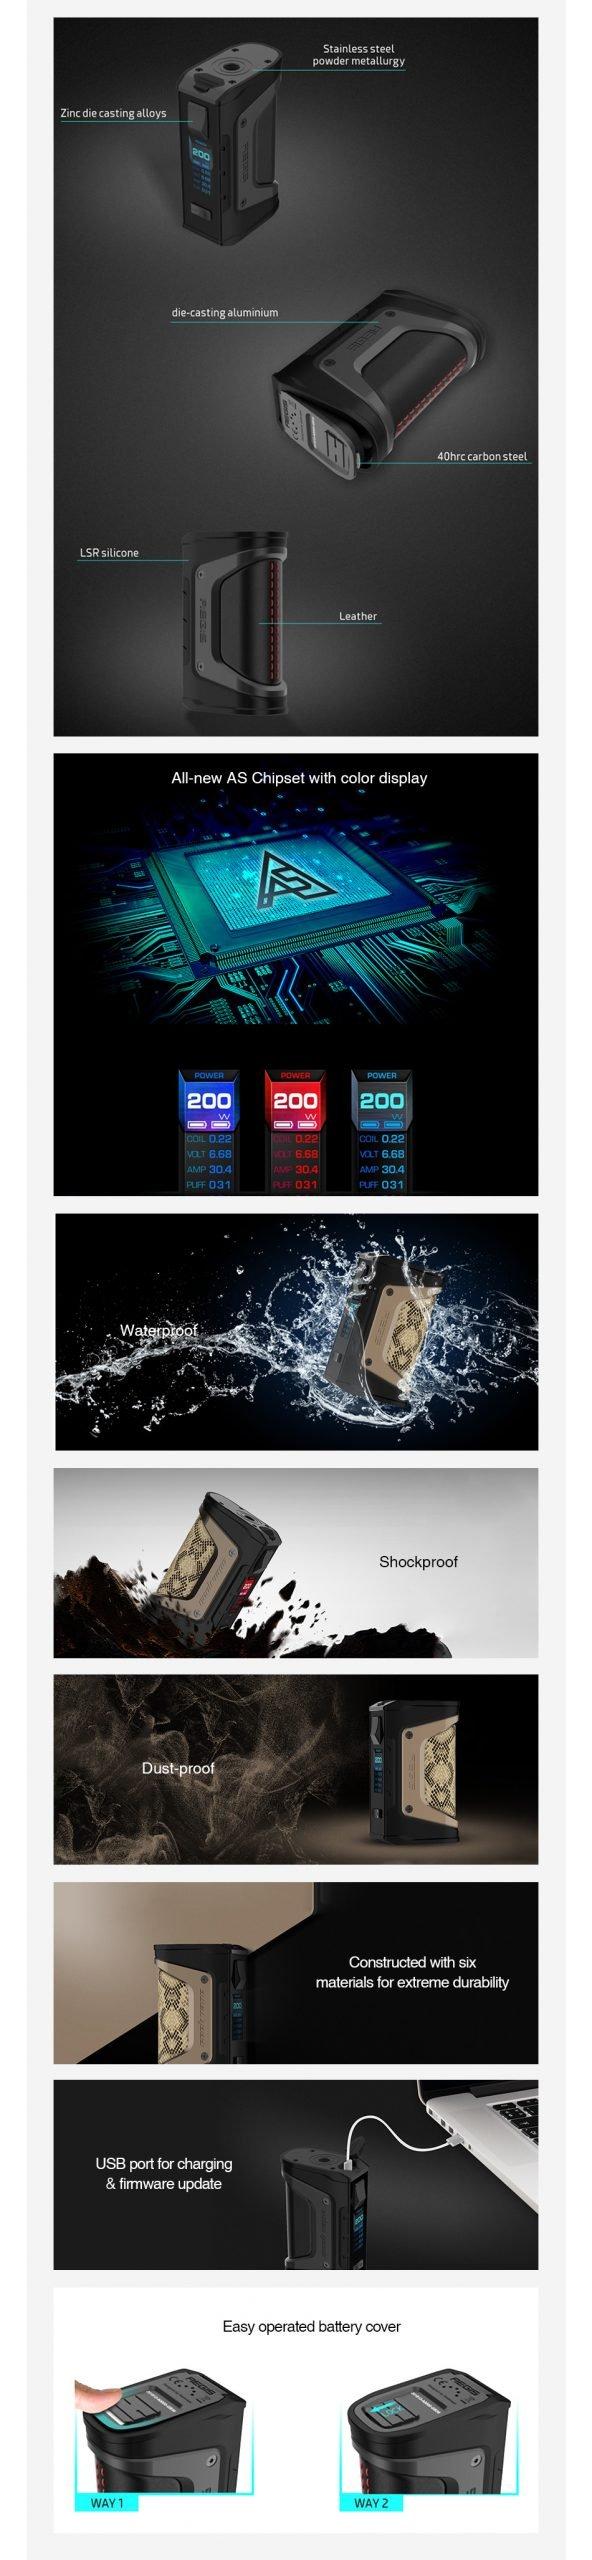 GeekVape-Aegis-Legend-200W-TC-Box-MOD-features-UK